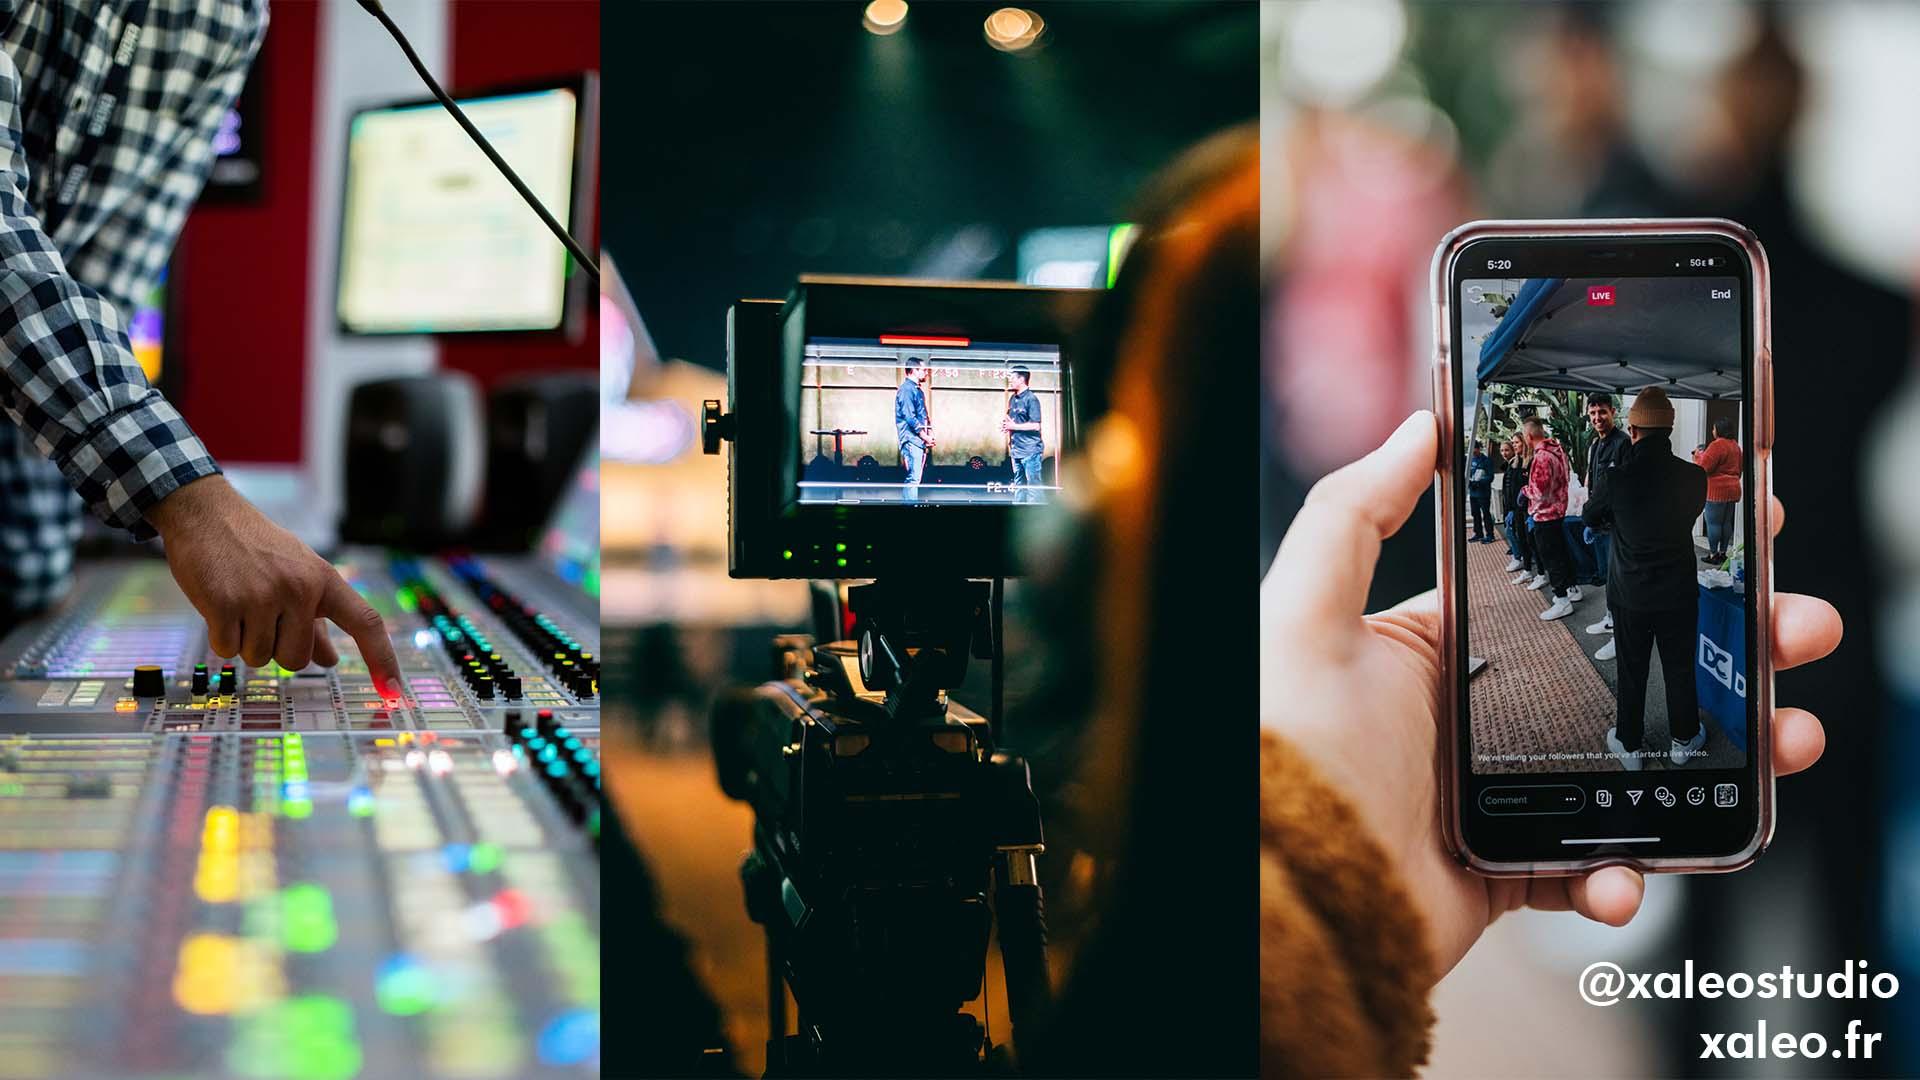 livestream-video-mobile-telephone-live-xaleo-studio